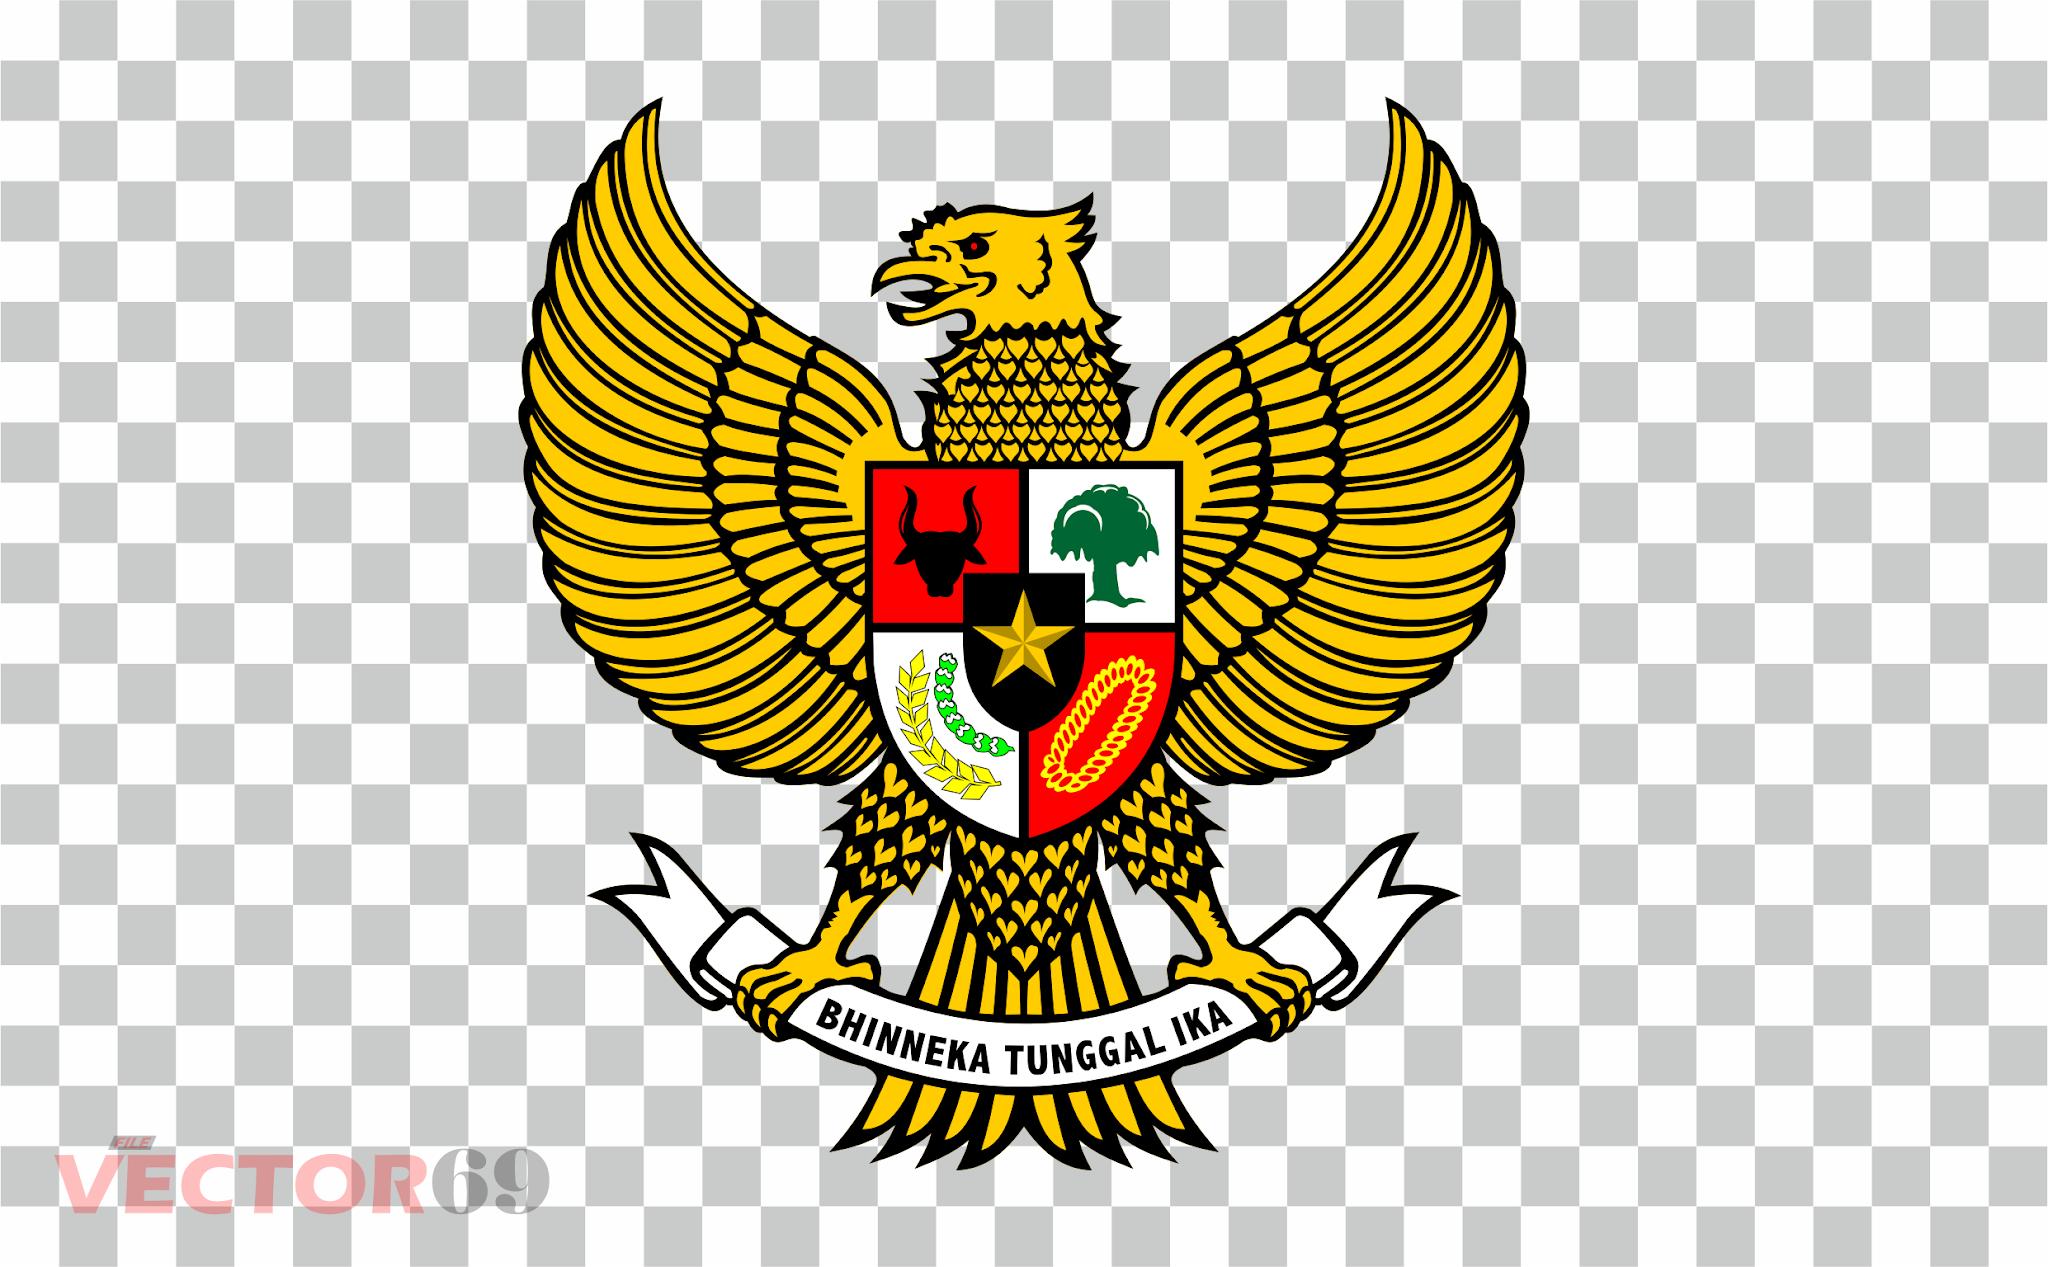 Lambang Garuda Pancasila - Download Vector File PNG (Portable Network Graphics)